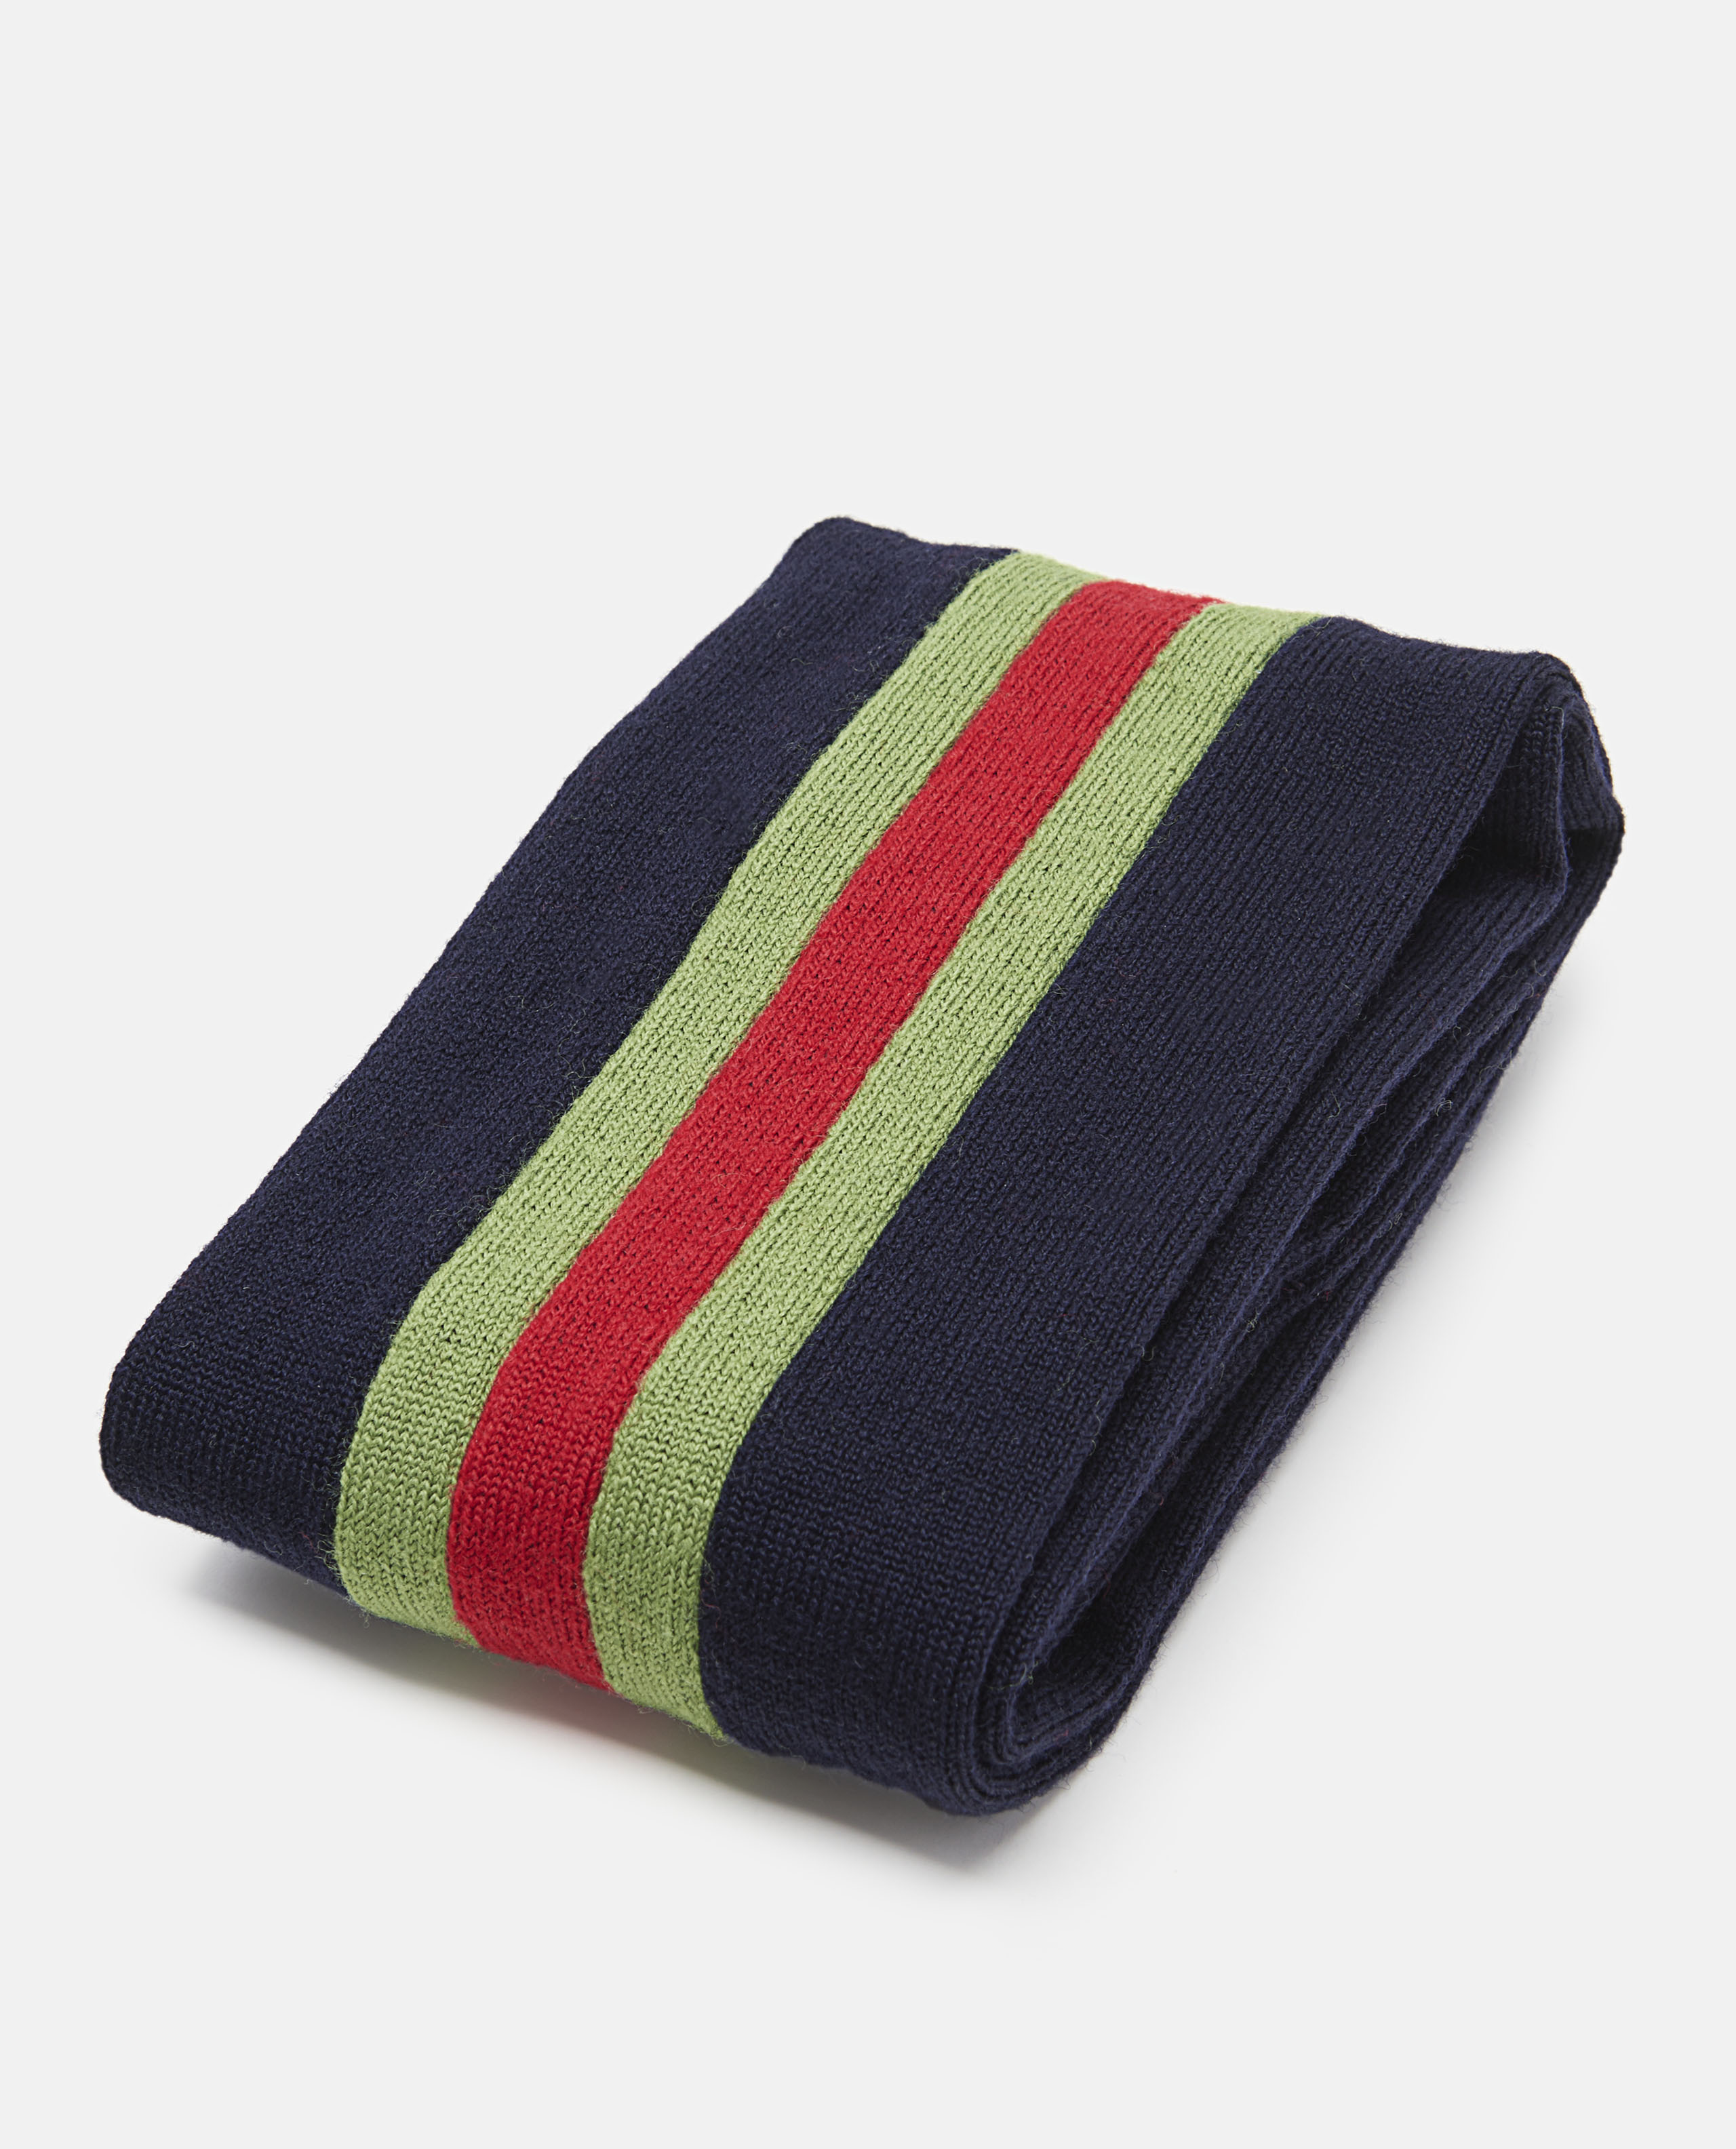 Wool Socks With Stripe